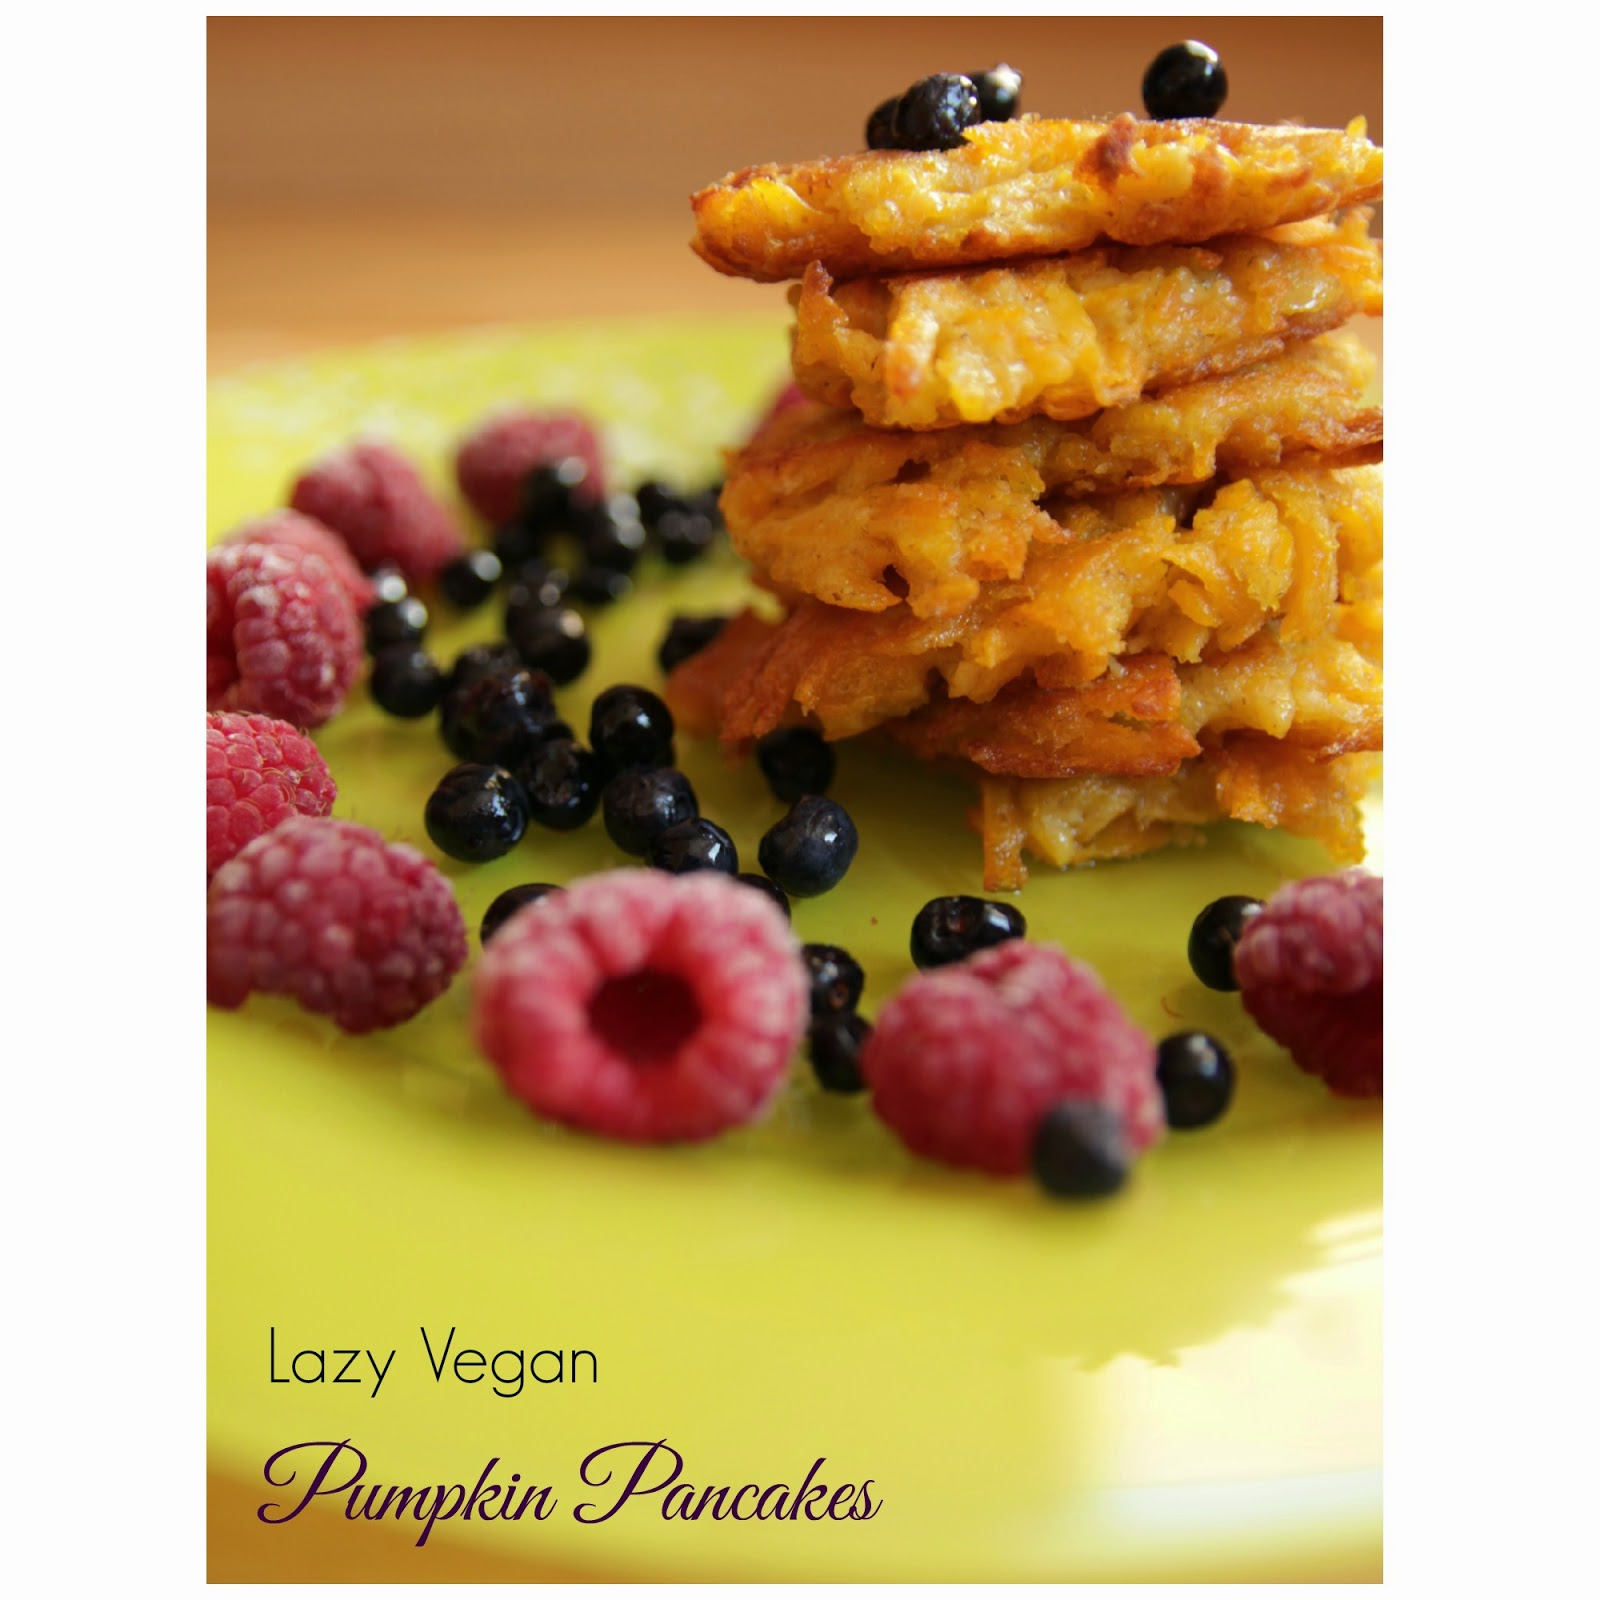 vegan pumpkin pancakes, lazy vegan